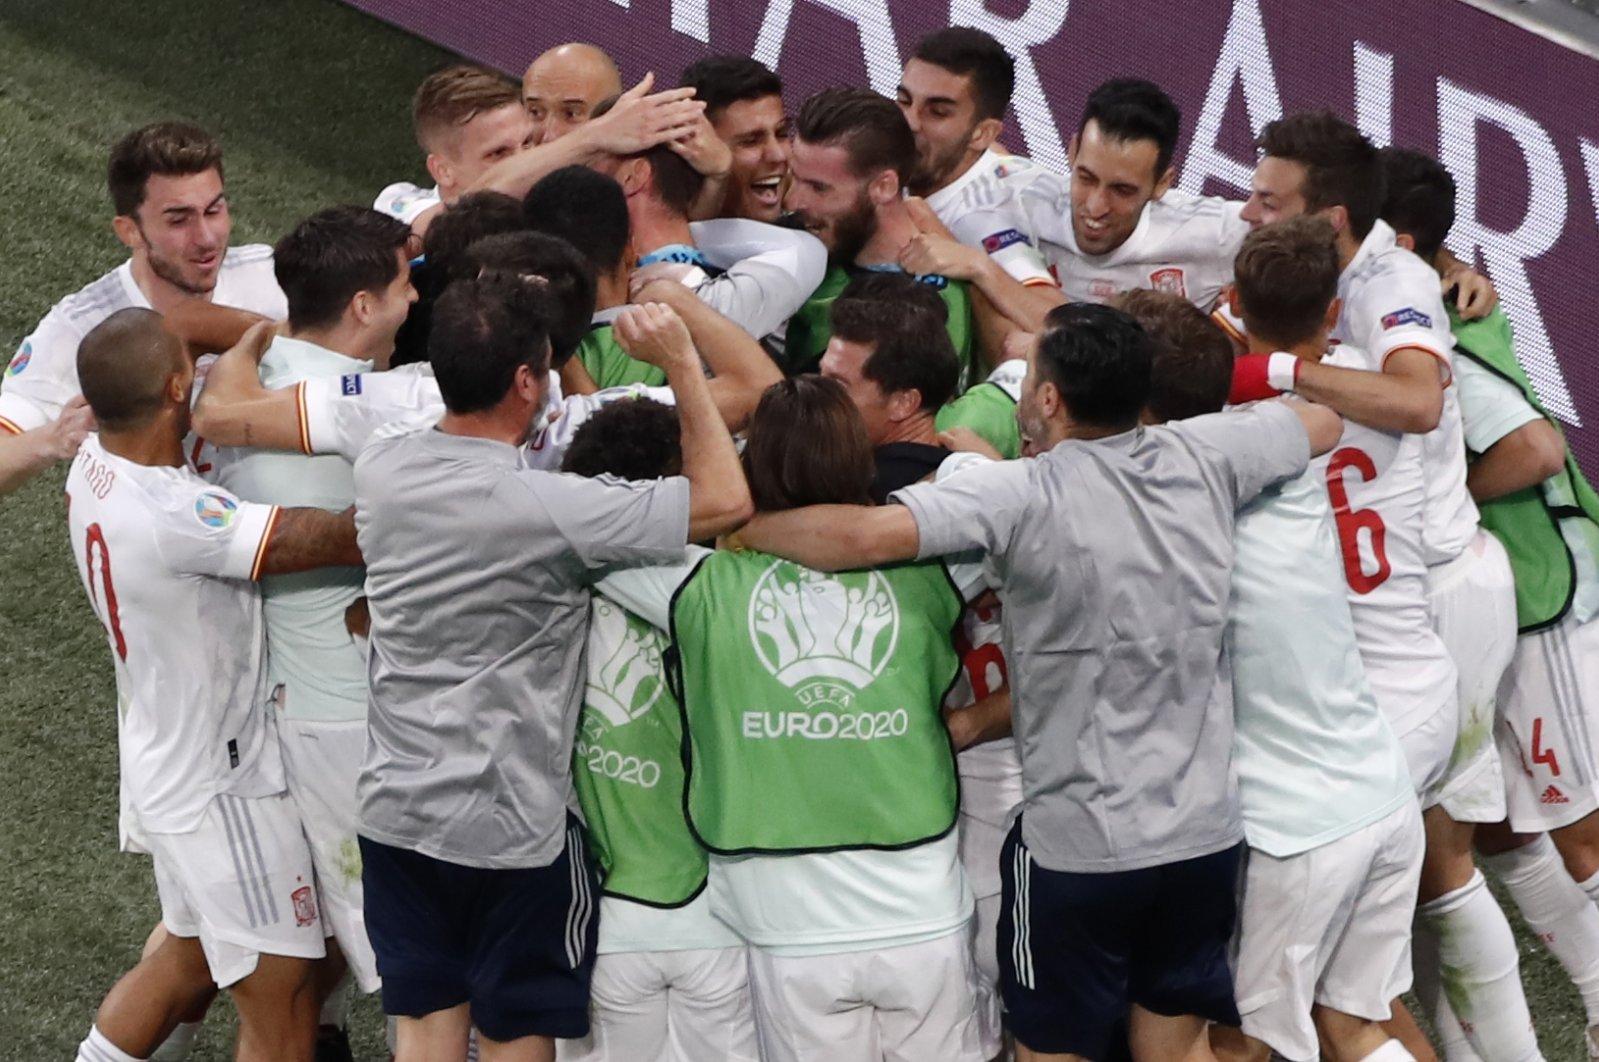 Spain's team celebrates after winning the Euro 2020 football championship quarterfinal match between Switzerland and Spain at Saint Petersburg Stadium in Saint Petersburg, Russia, July 2, 2021. (AP Photo)